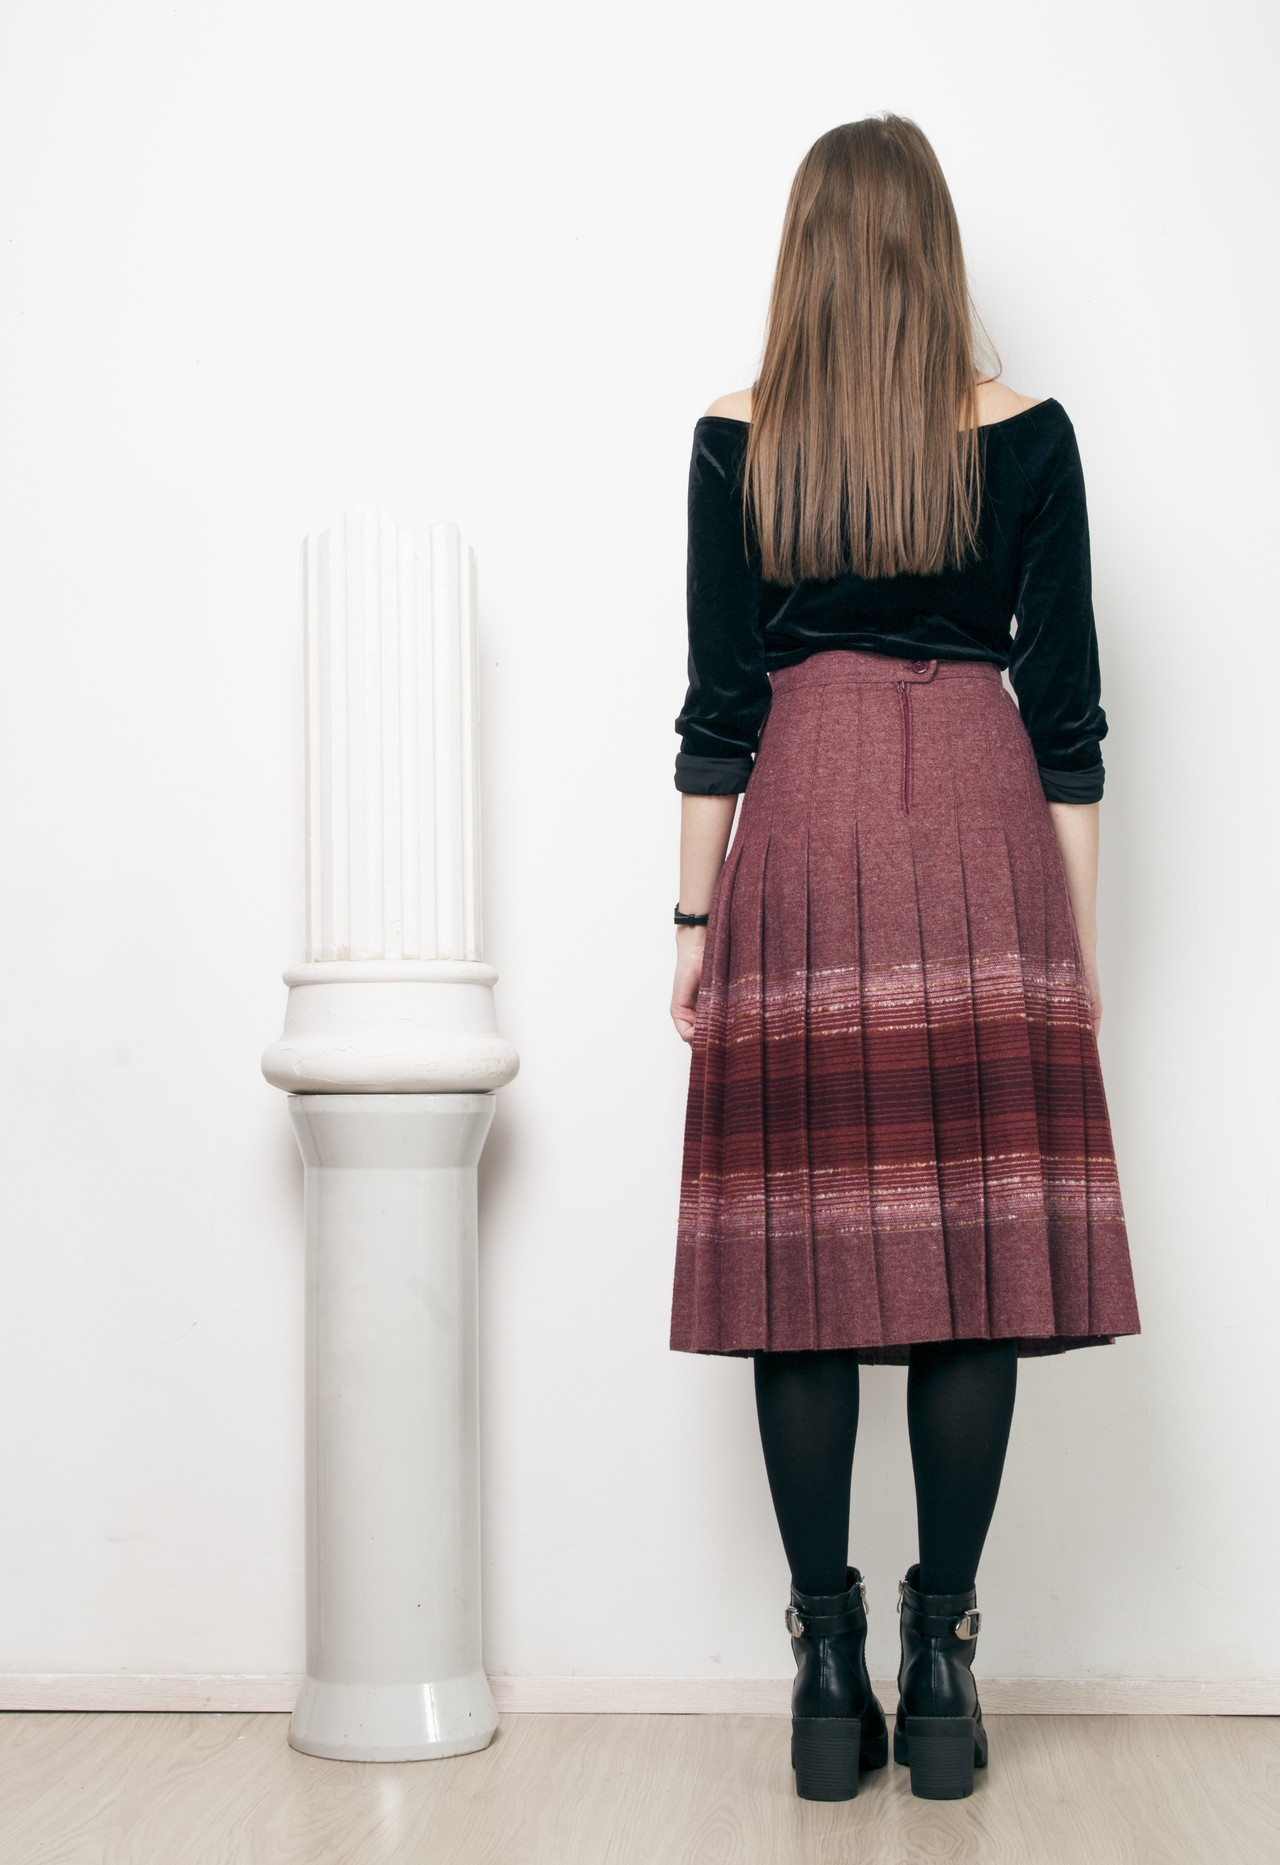 b8d8c11f 70s vintage pleated hippie skirt · Pop Sick · Online Store Powered ...